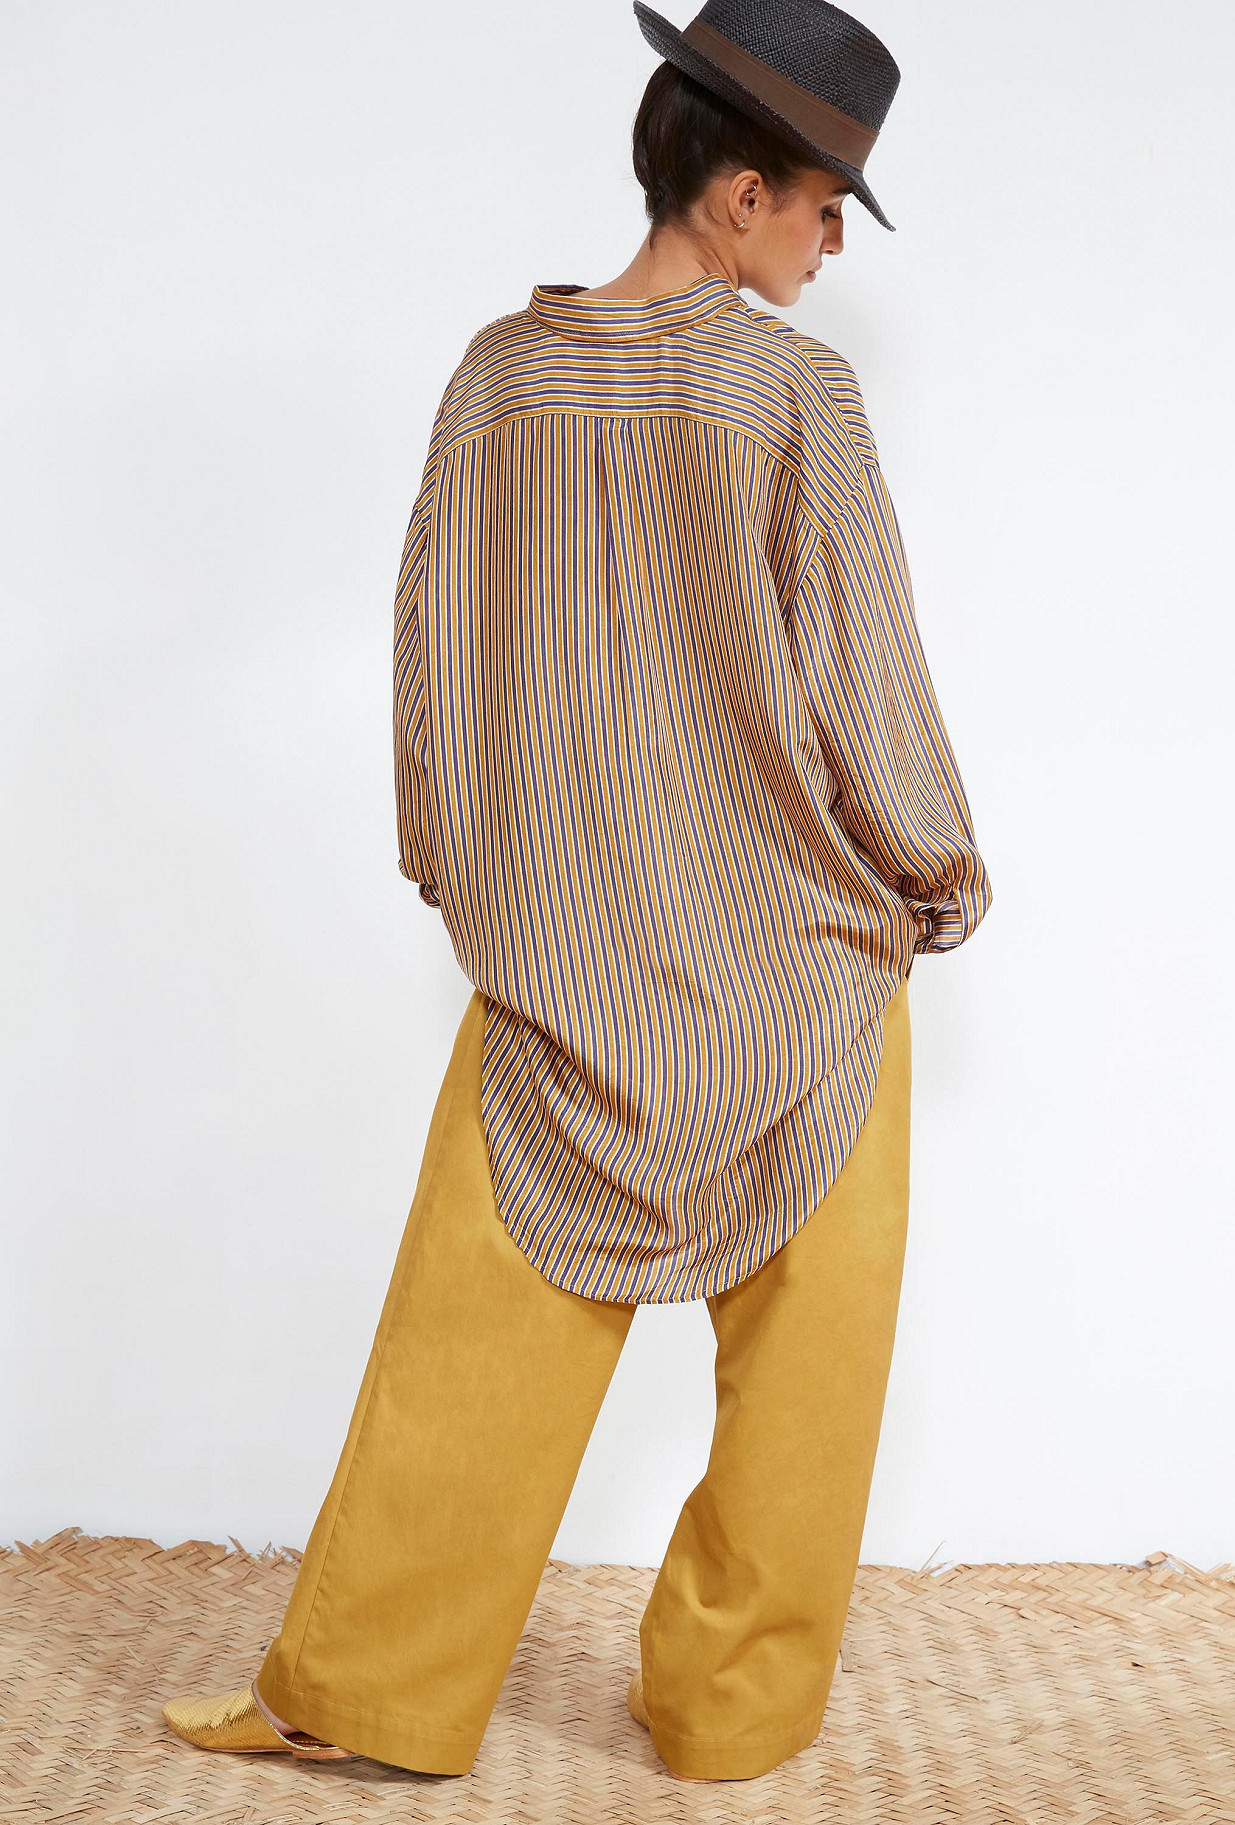 clothes store SHIRT  Bridgetown french designer fashion Paris